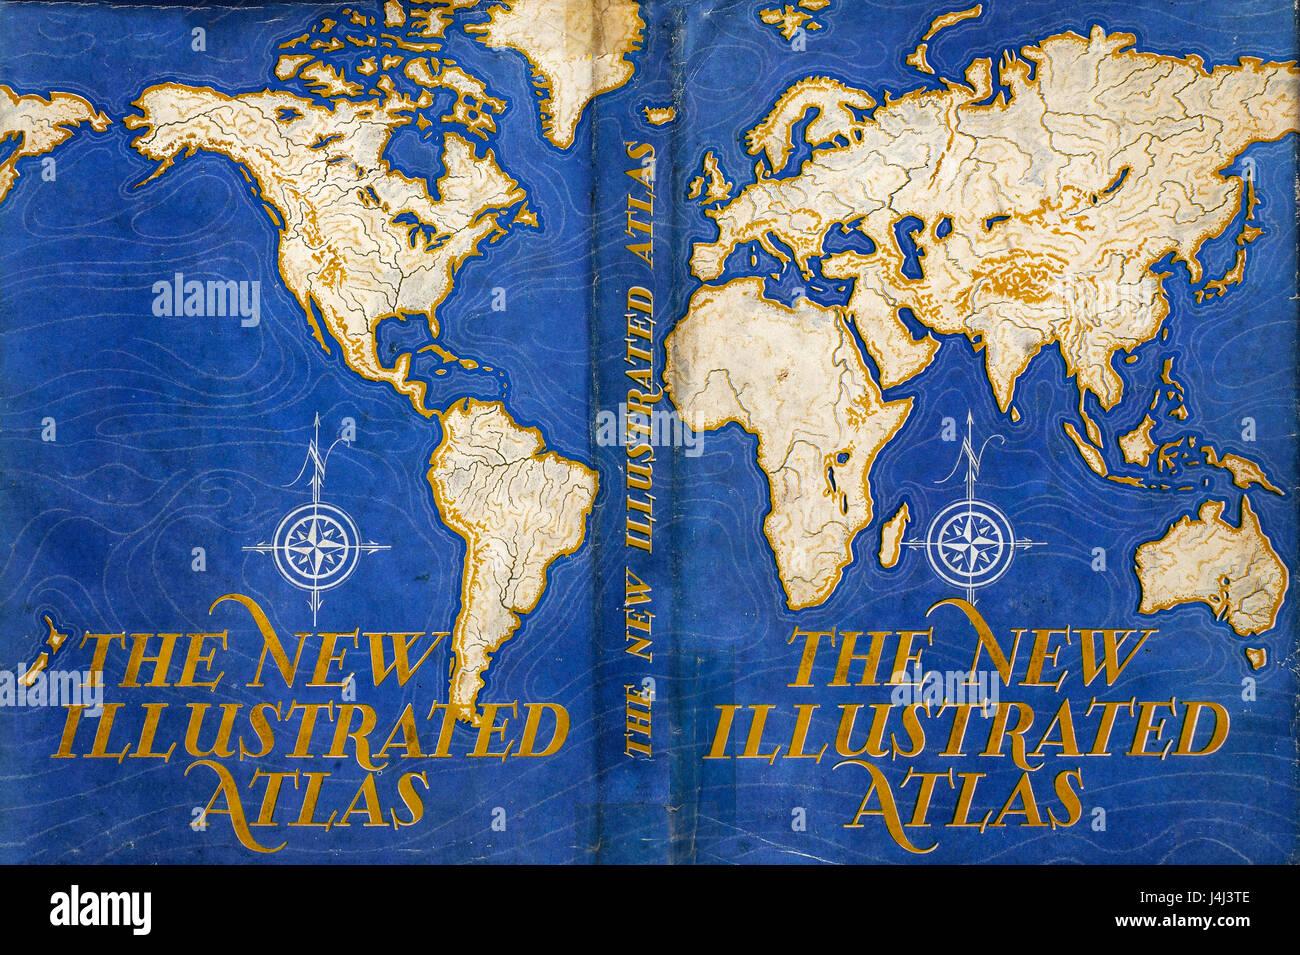 Illustration of atlas map - Stock Image